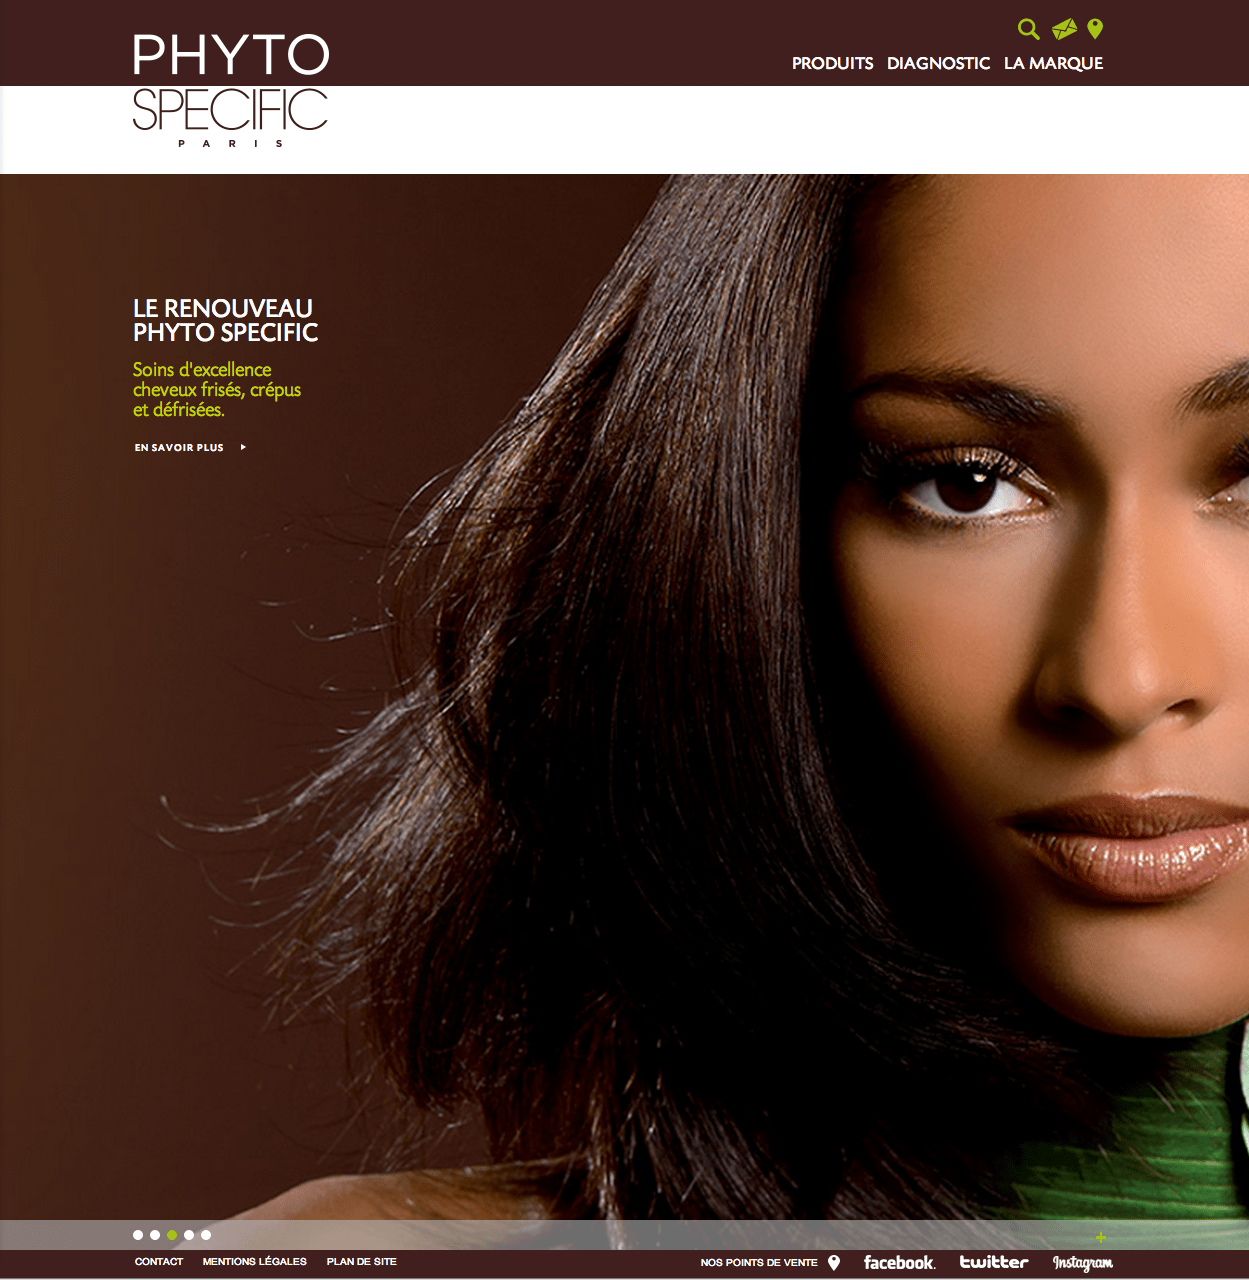 phyto home